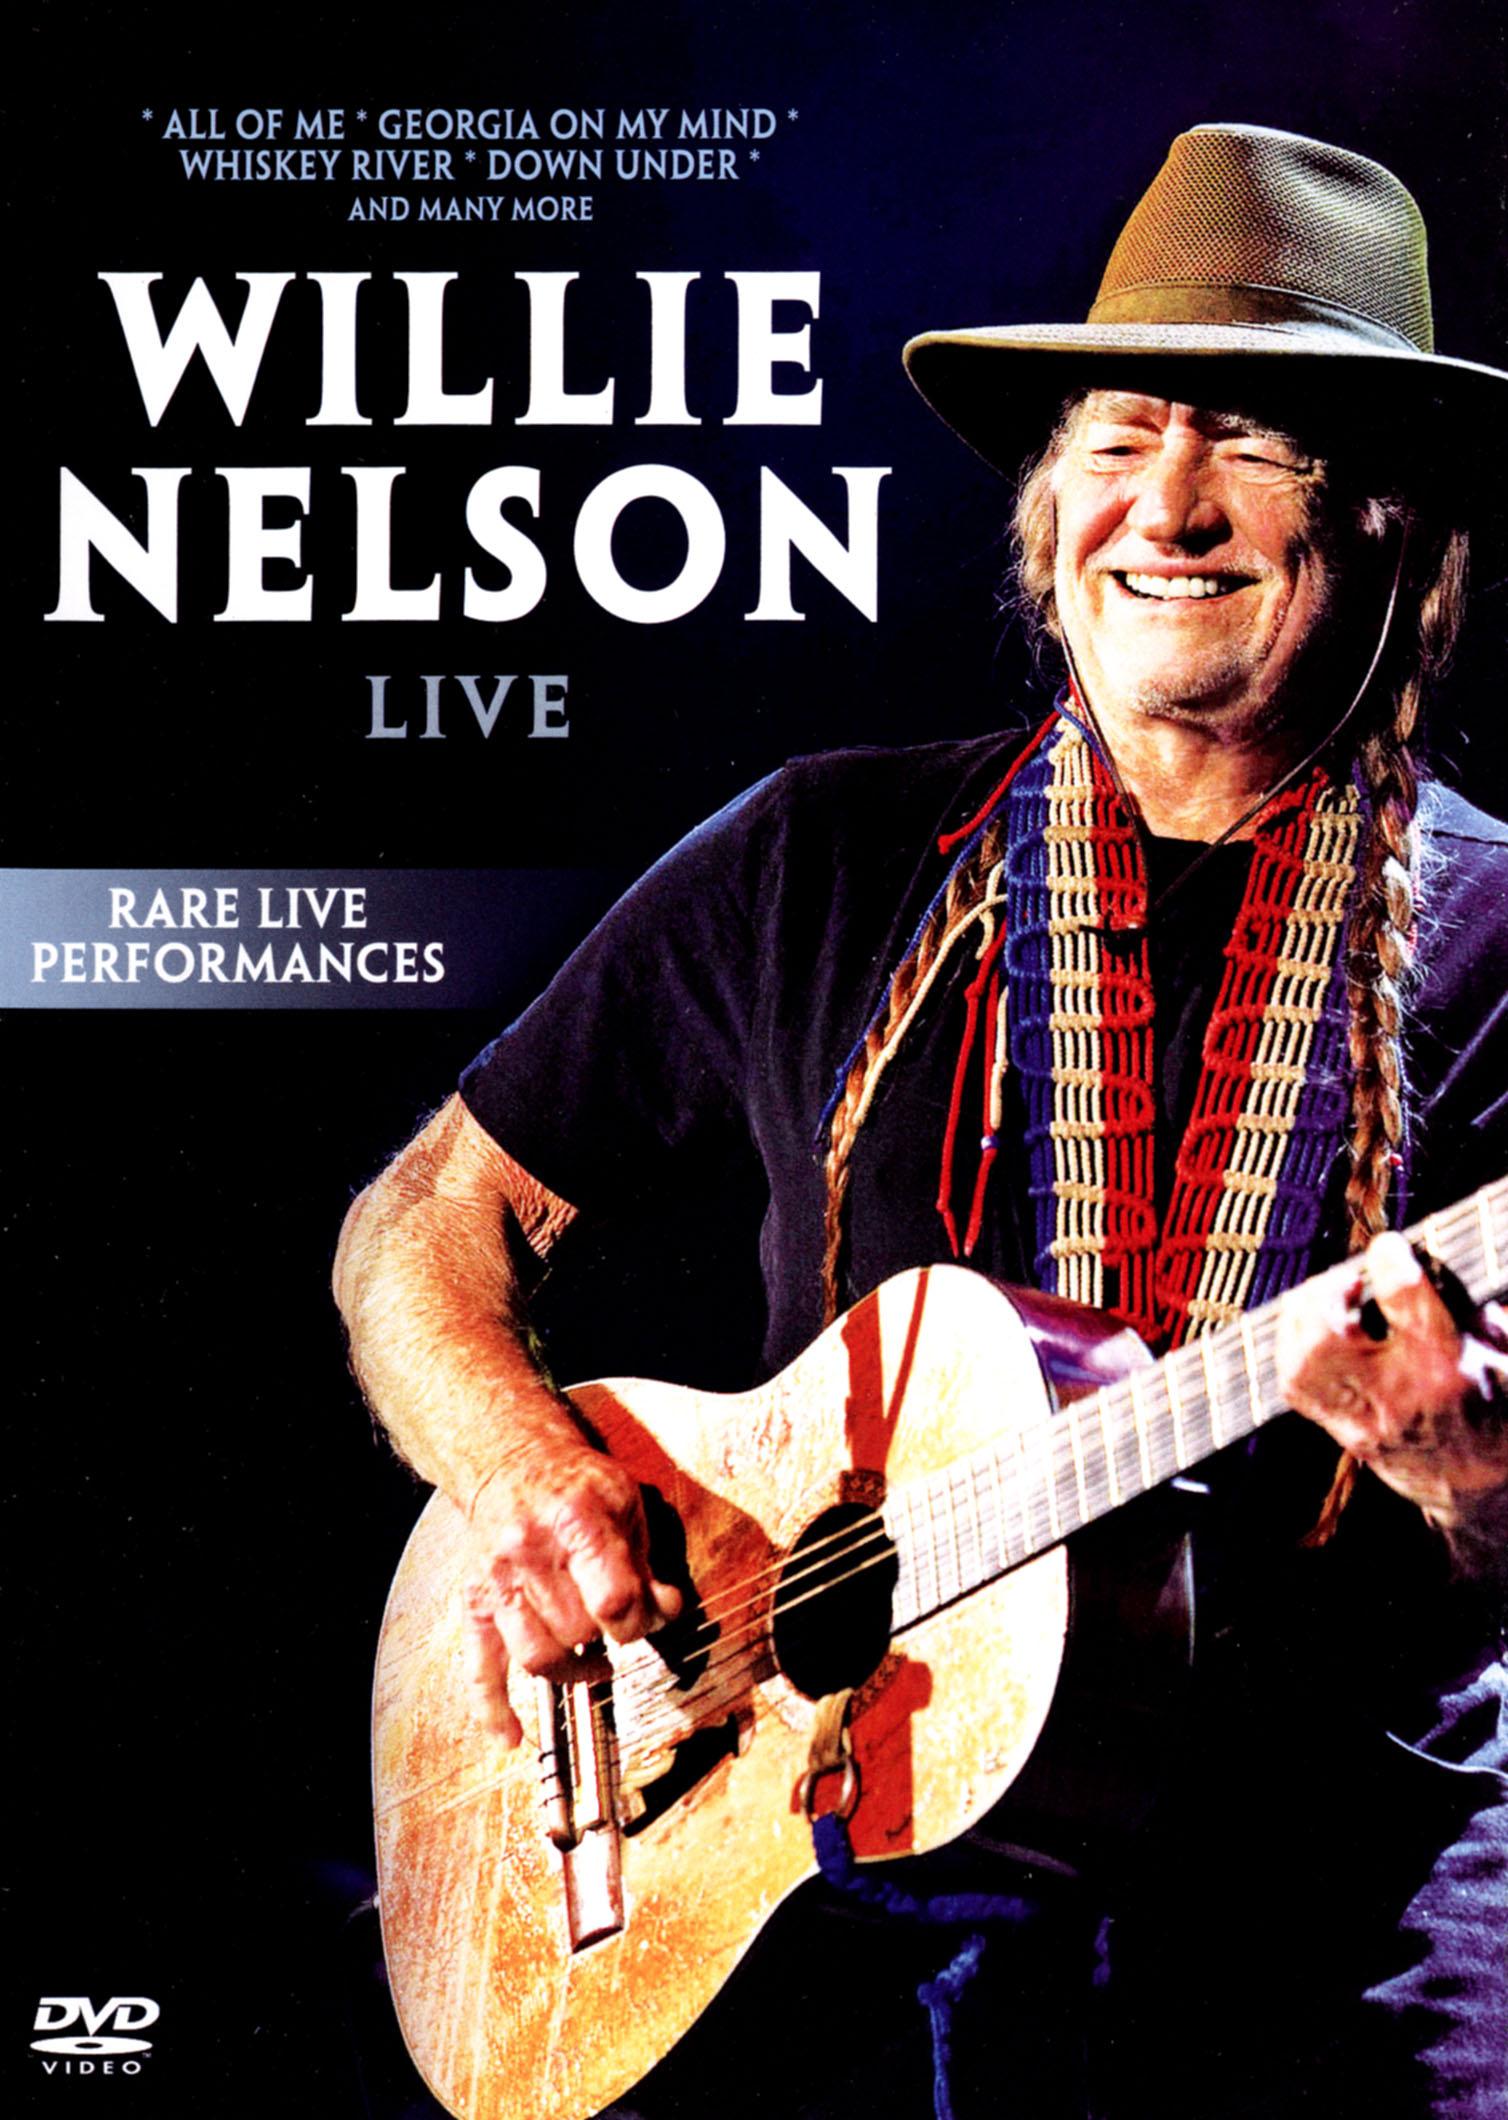 Willie Nelson: Live - Rare Live Performances